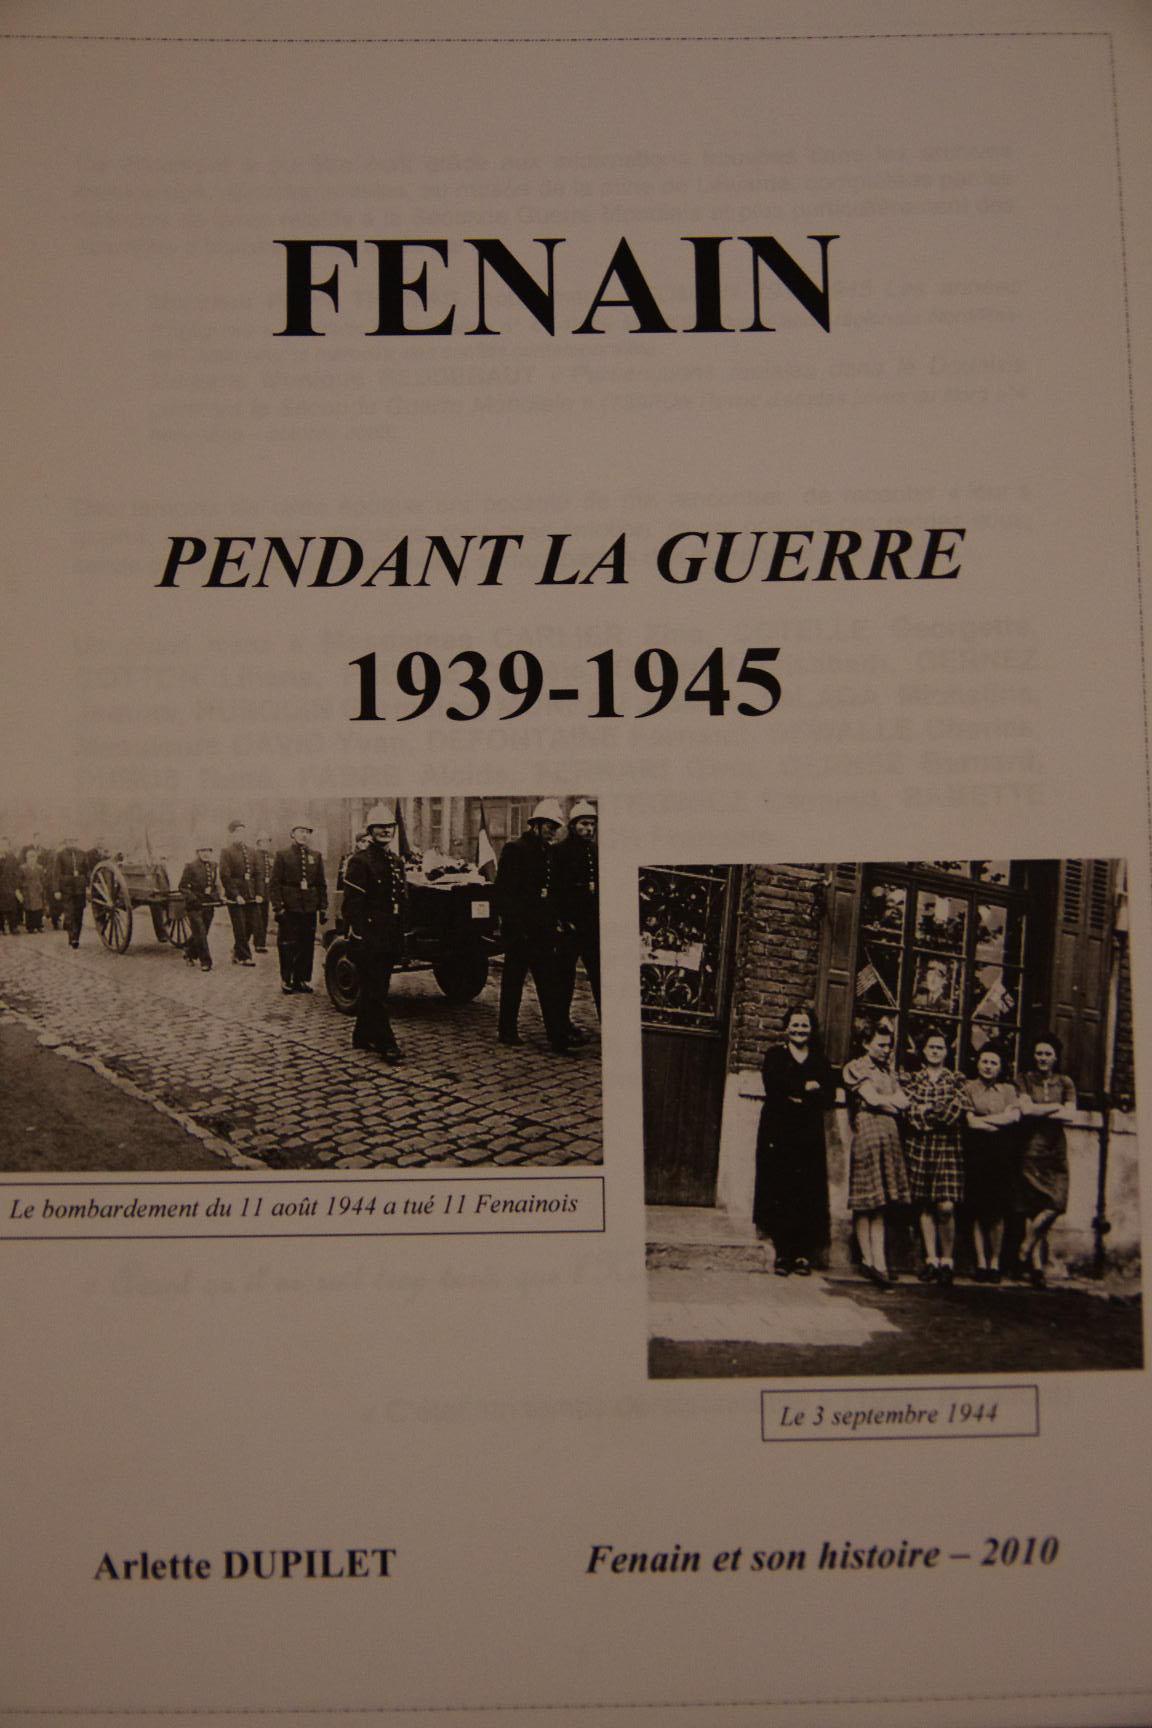 entete publi Fenain pendant la guerre 39-45 0.jpg